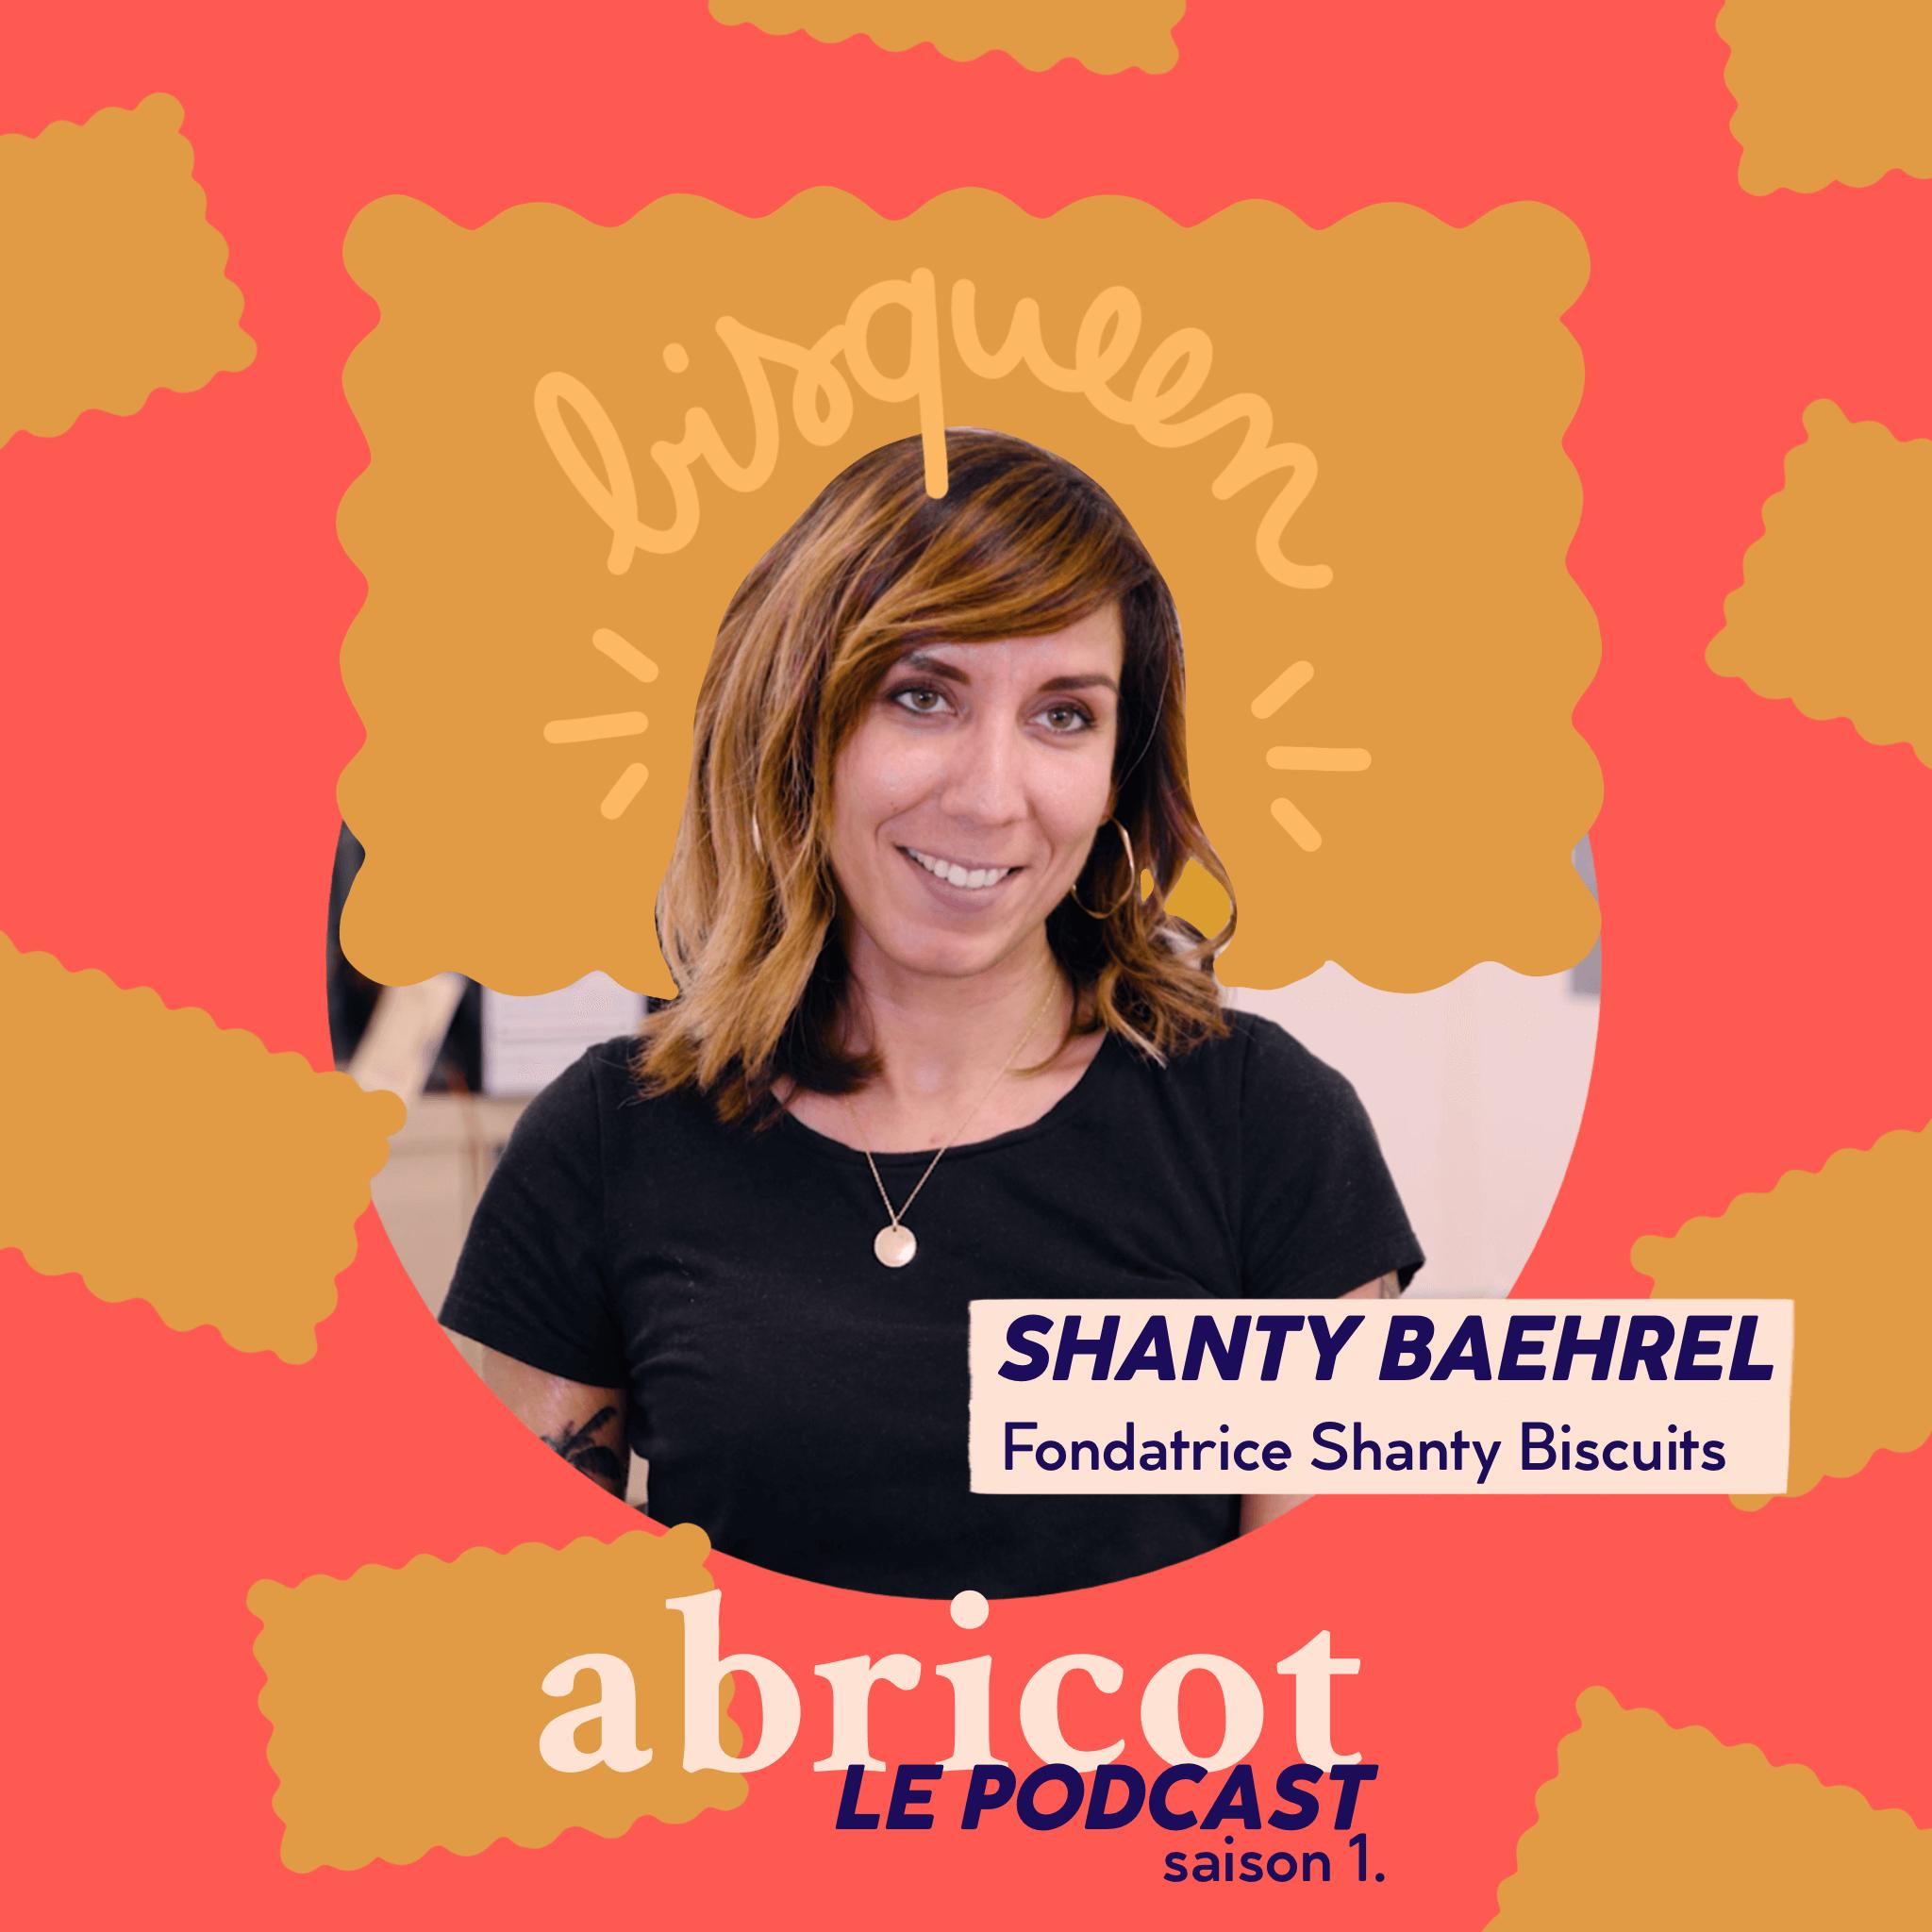 Podcast Abricot épisode 6. Shanty Baehrel